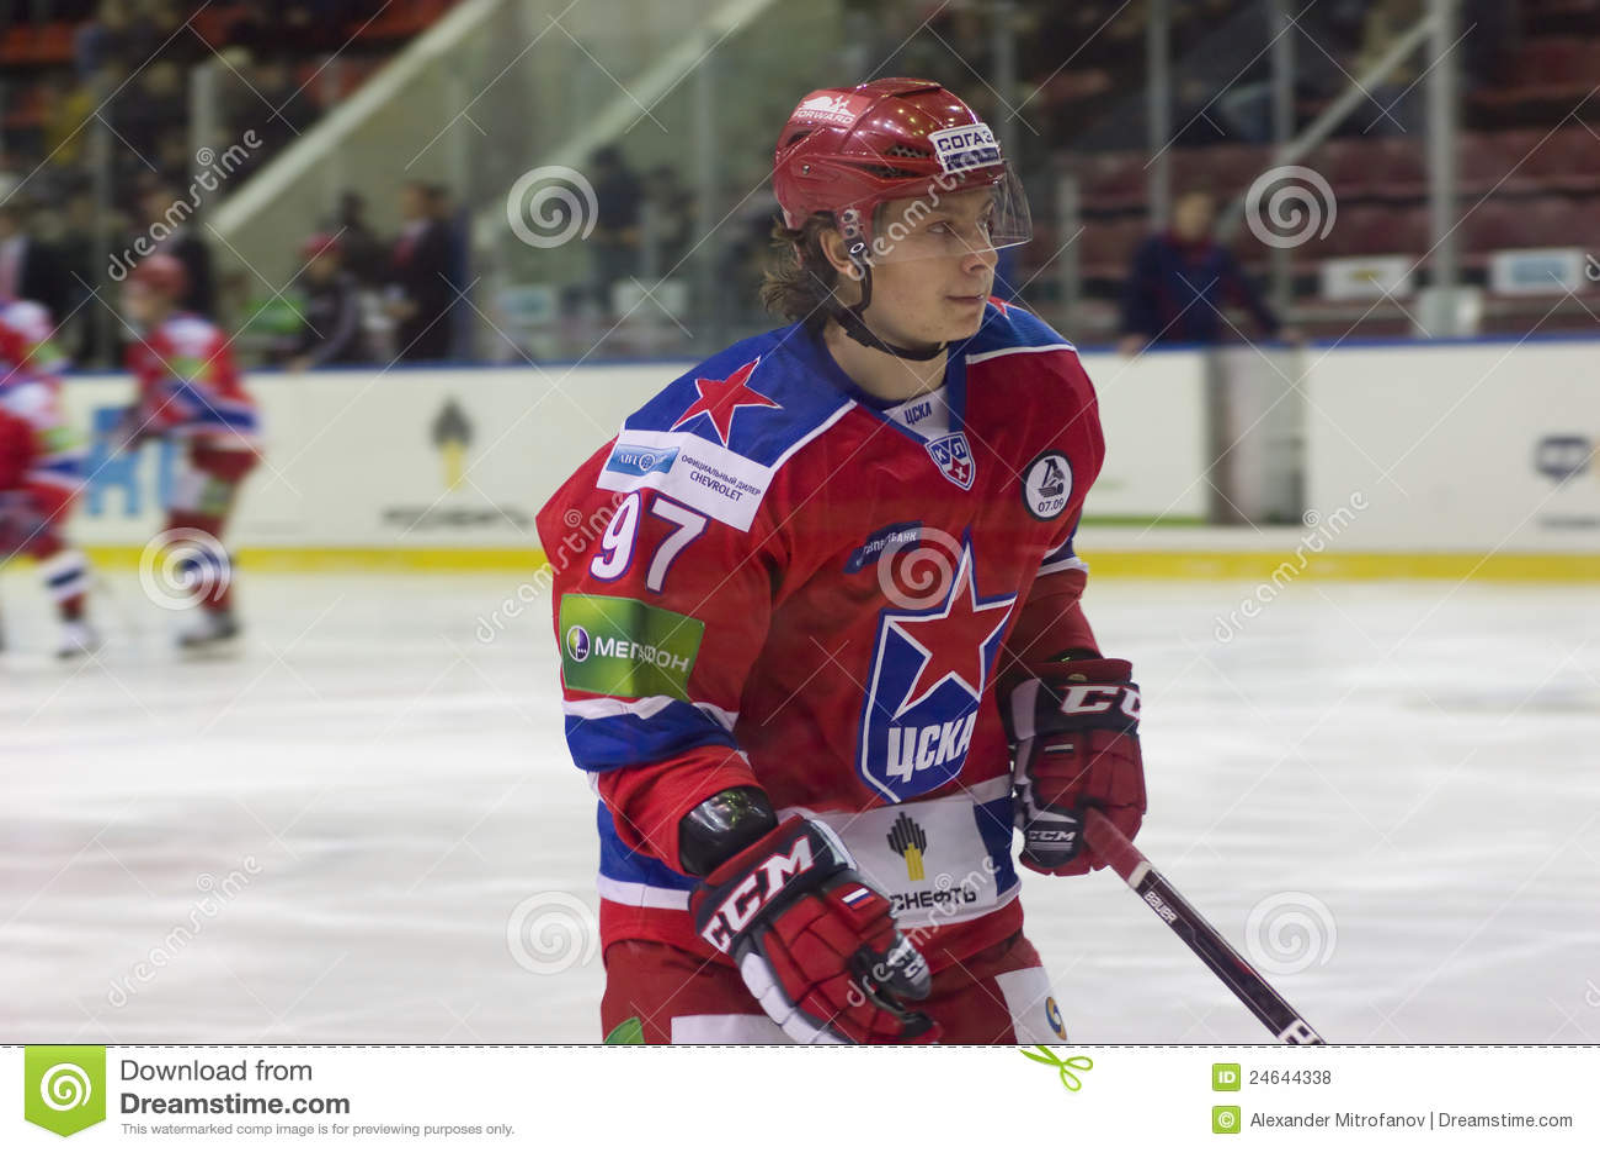 Gusev Nikita. Forward Of CSKA Team Editorial Stock Photo ...